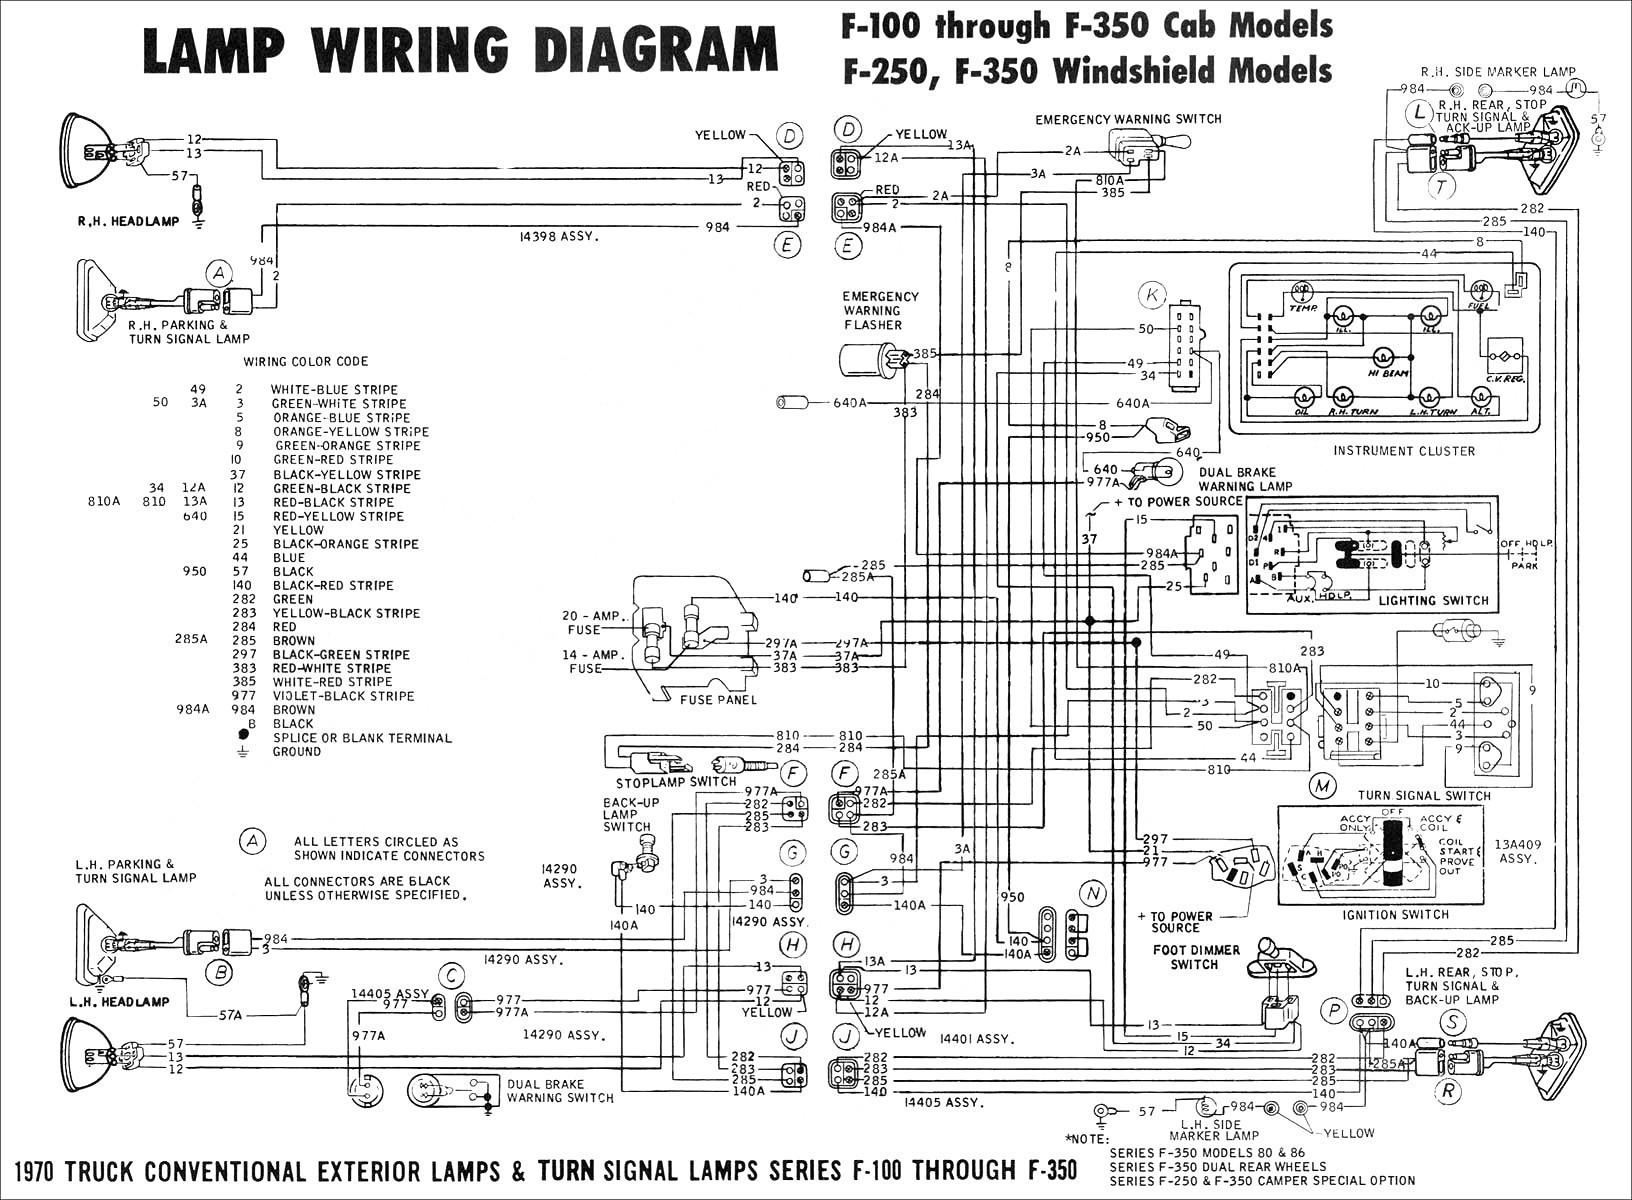 Bmw 325ci Engine Diagram 1999 Bmw 540i Engine Diagram Another Blog About Wiring Diagram • Of Bmw 325ci Engine Diagram